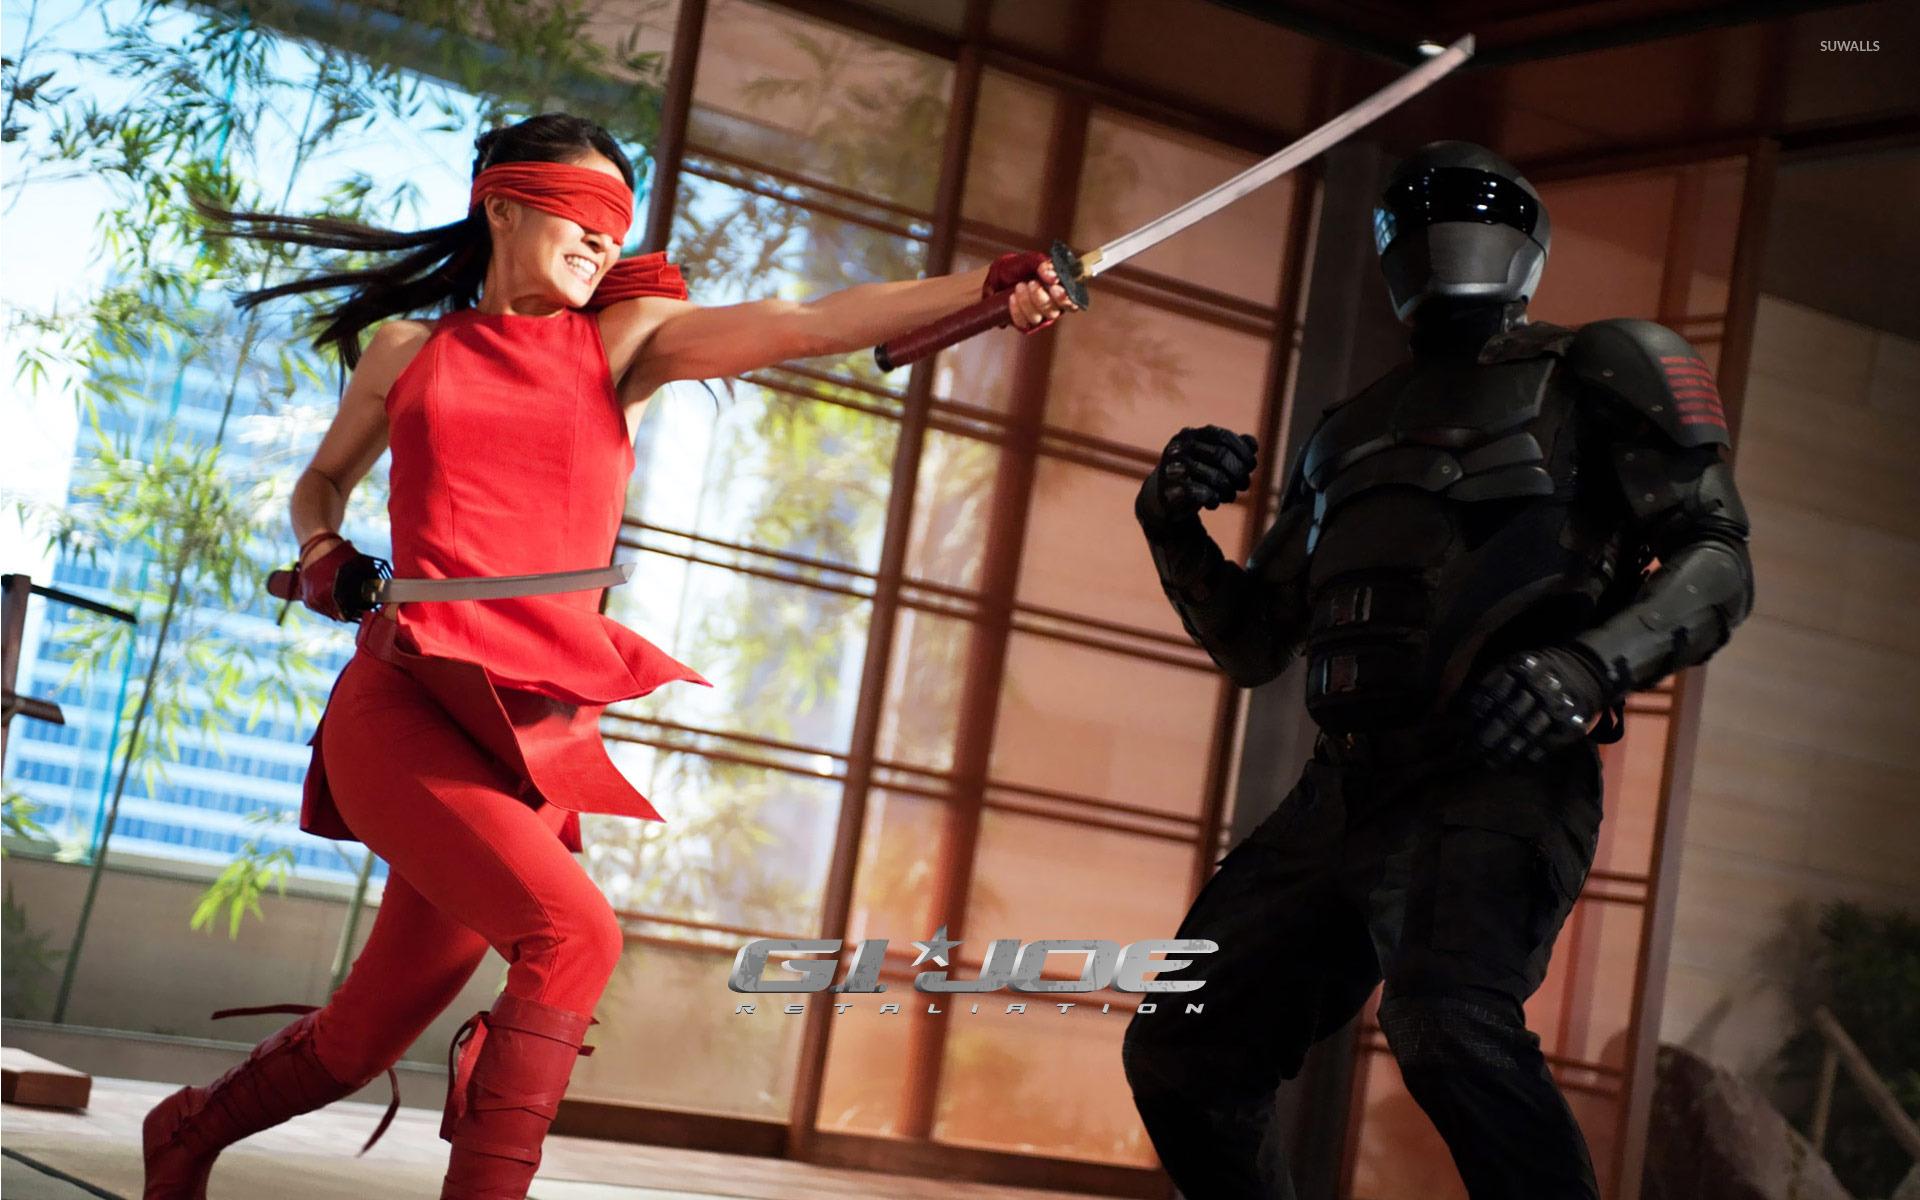 jinx and snake eyes - g.i. joe: retaliation wallpaper - movie